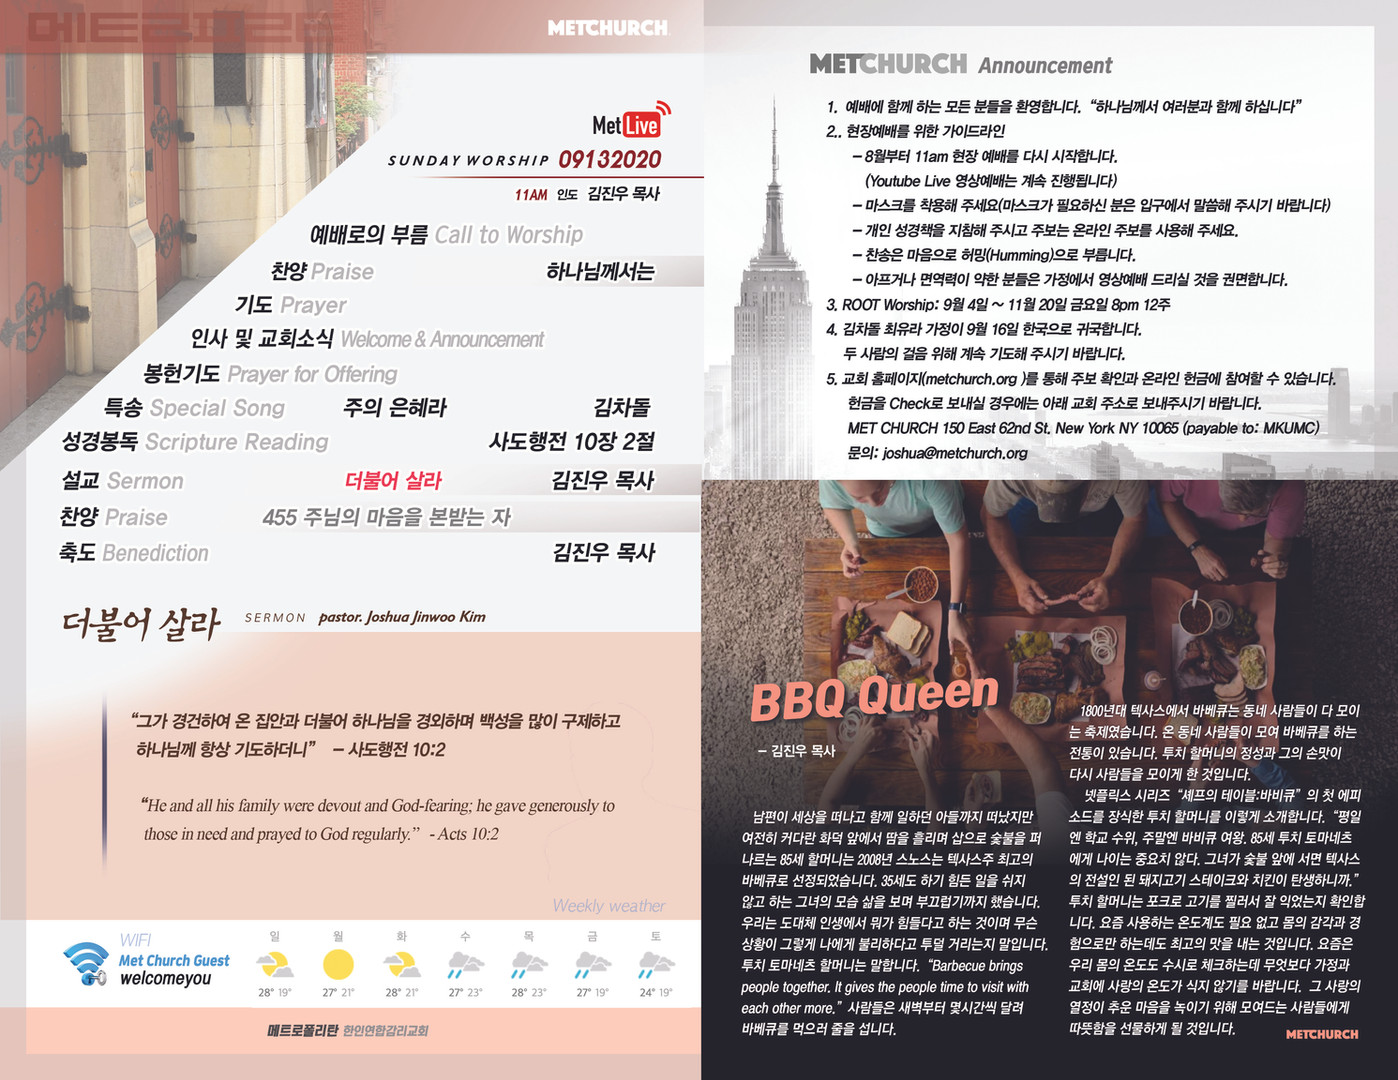 MetChurch_paper_Back_09132020.jpg